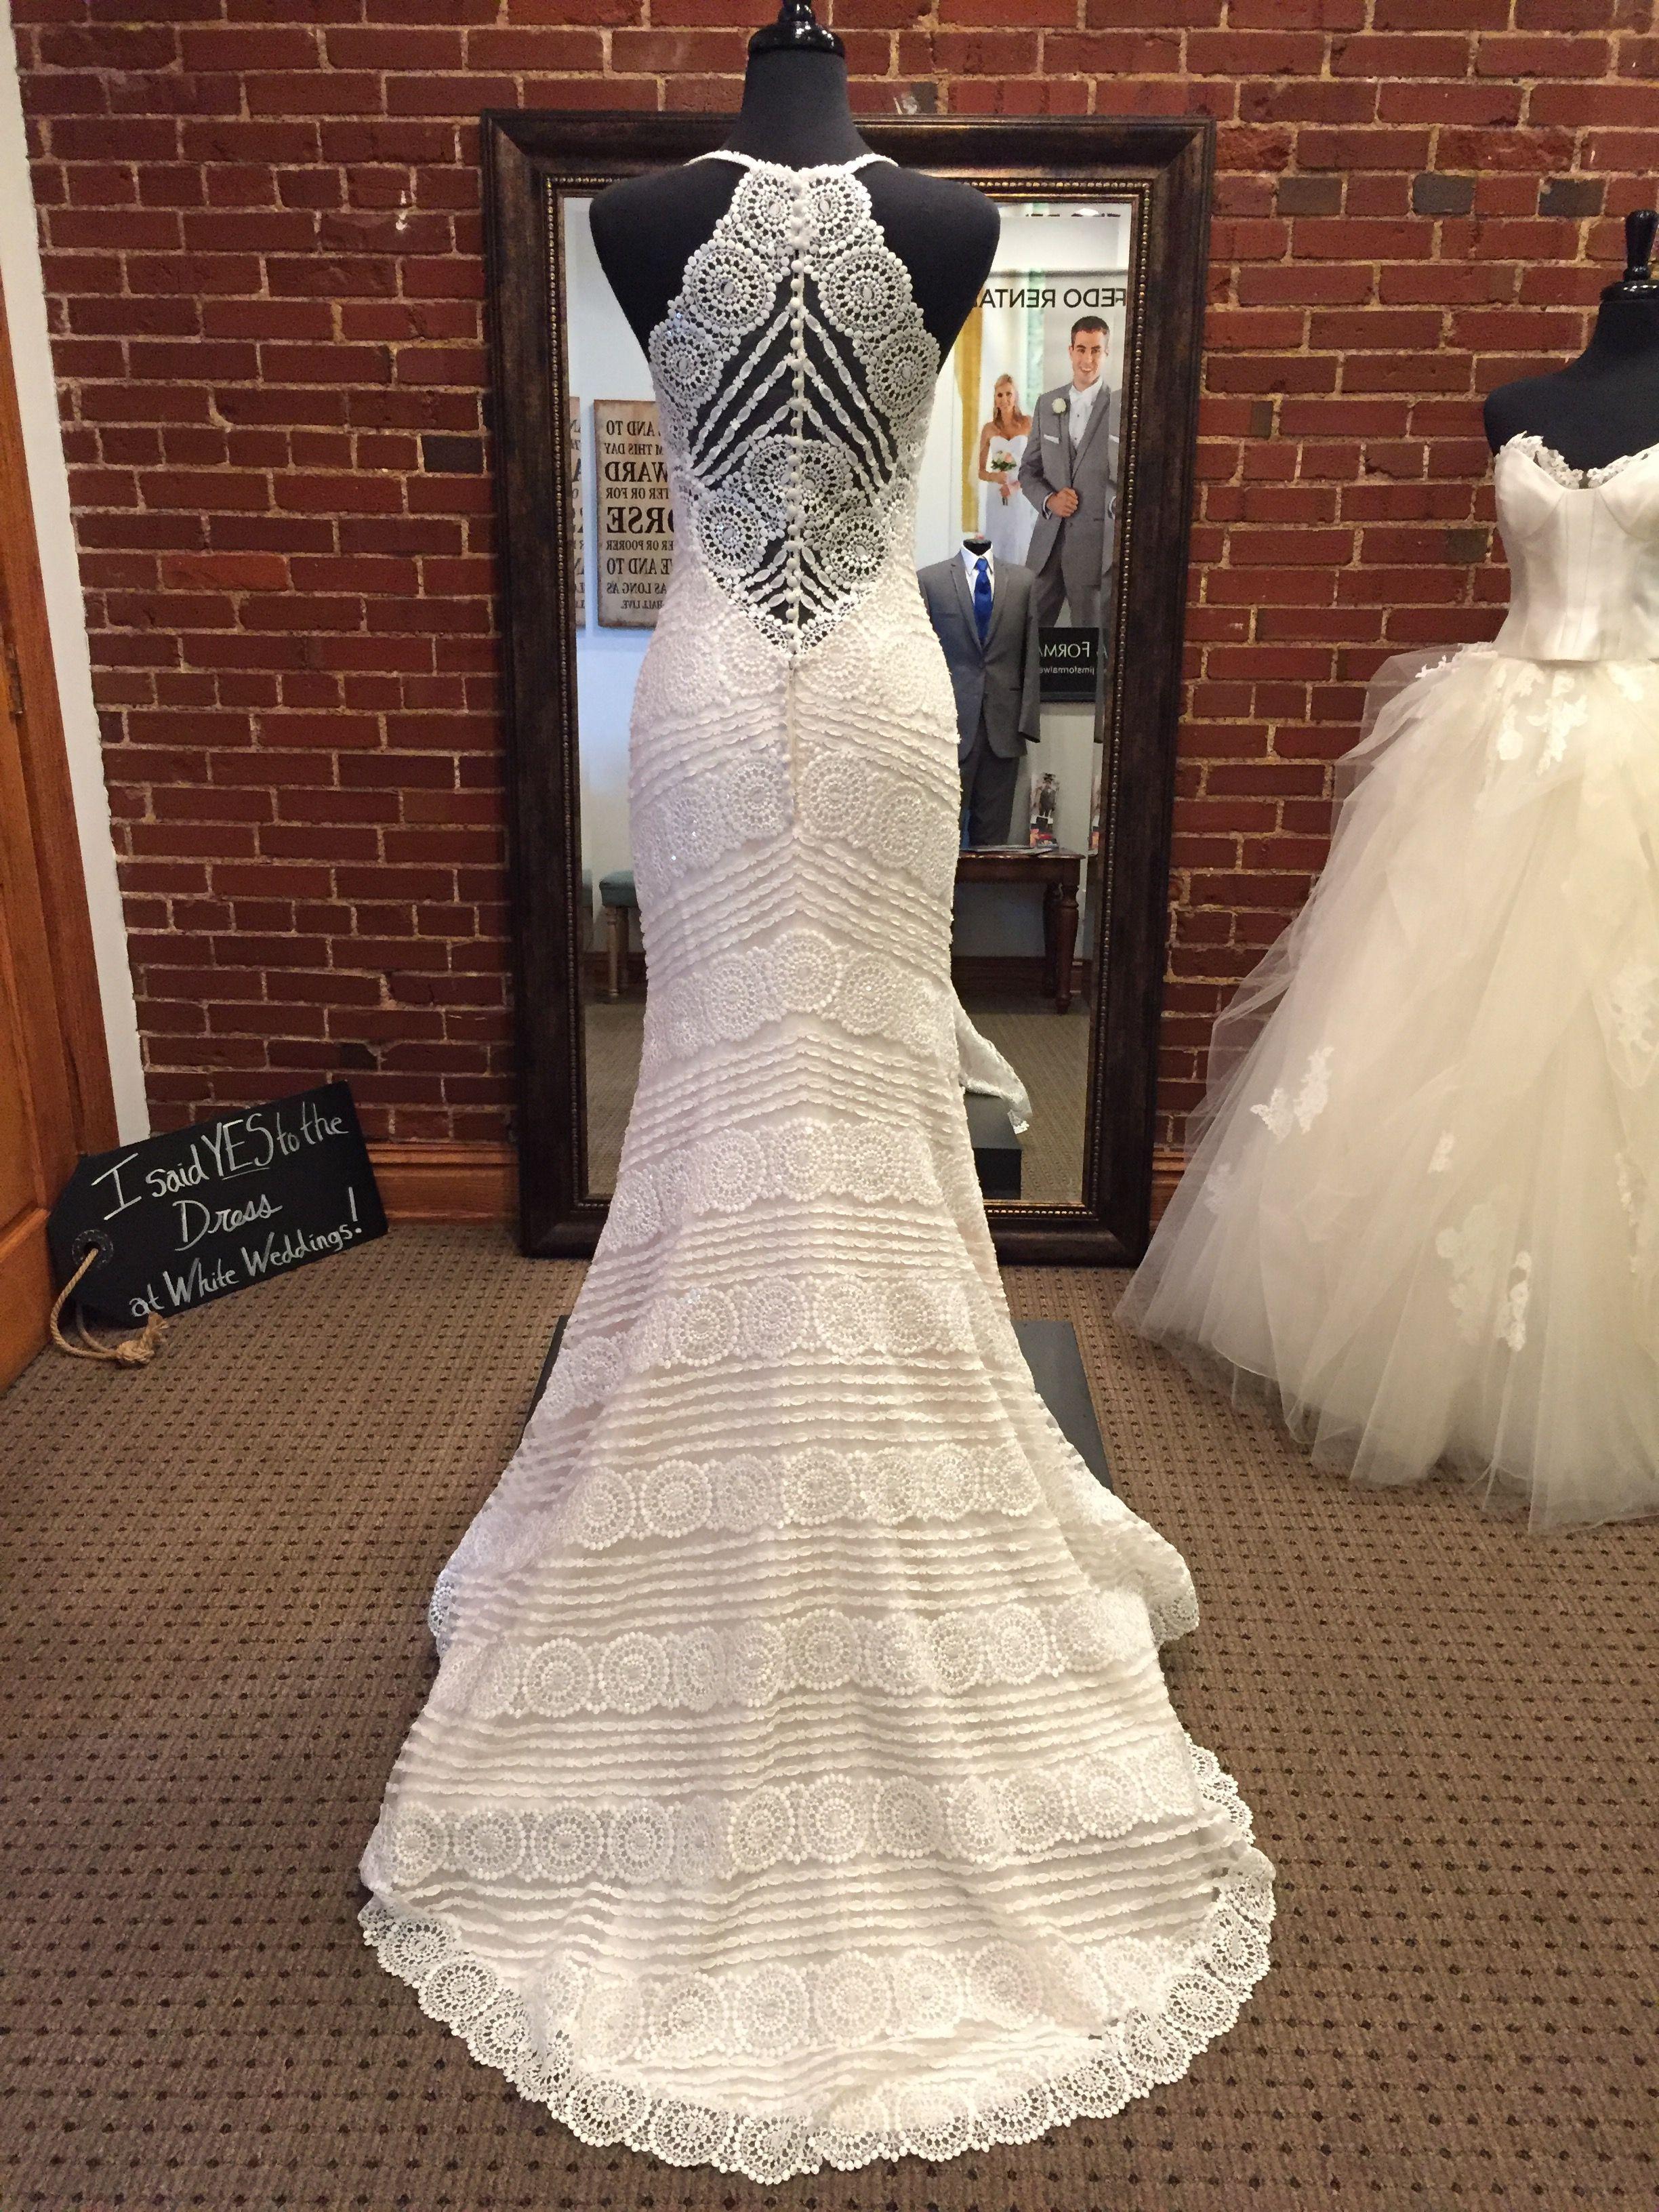 Cheap boho wedding dresses  The perfect boho wedding dress Bexley features a unique lace design